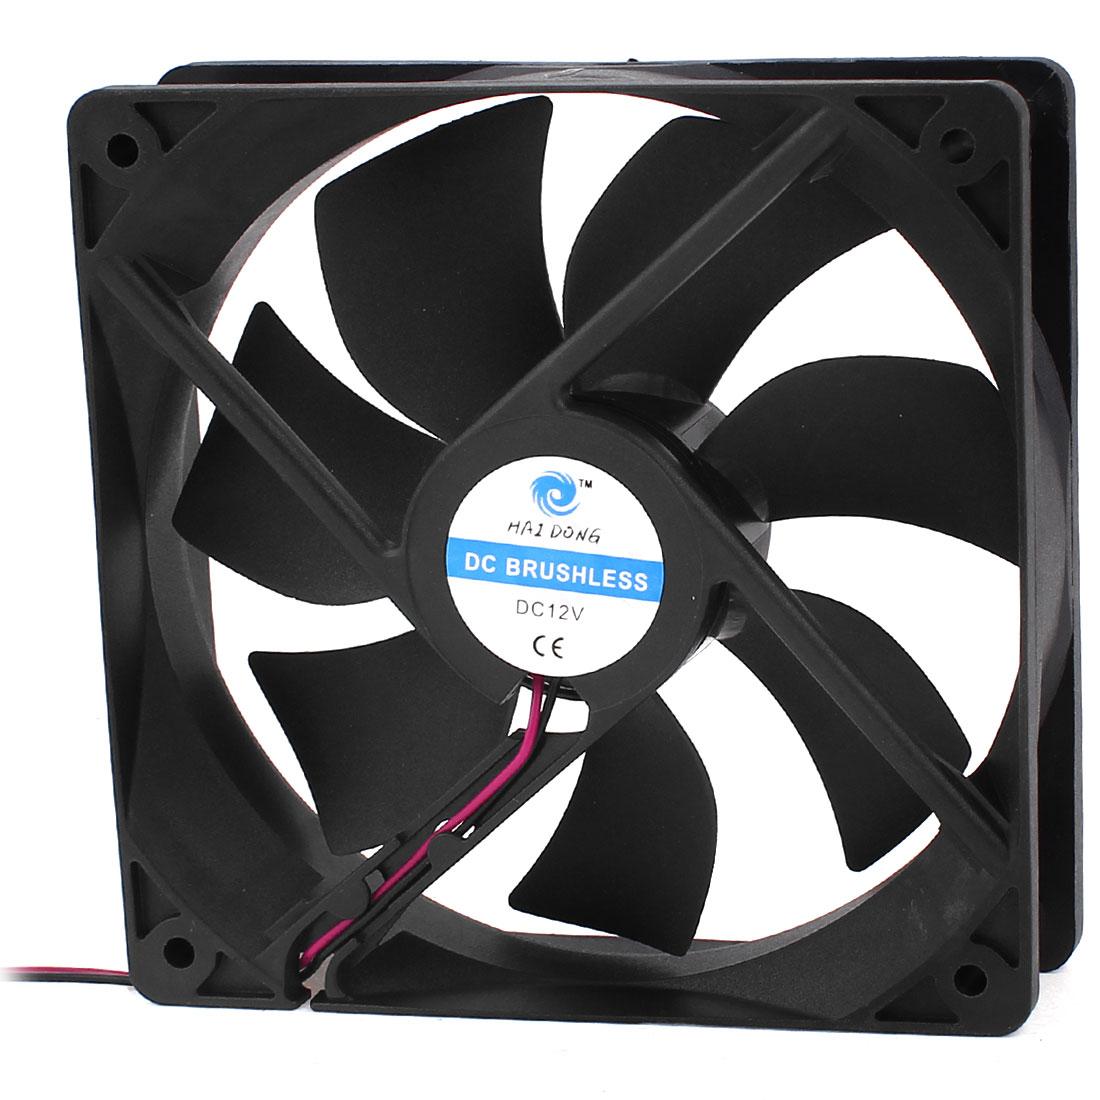 120mm x 25mm 12025 Brushless Cooling Fan DC 12V for Computer Case CPU Cooler